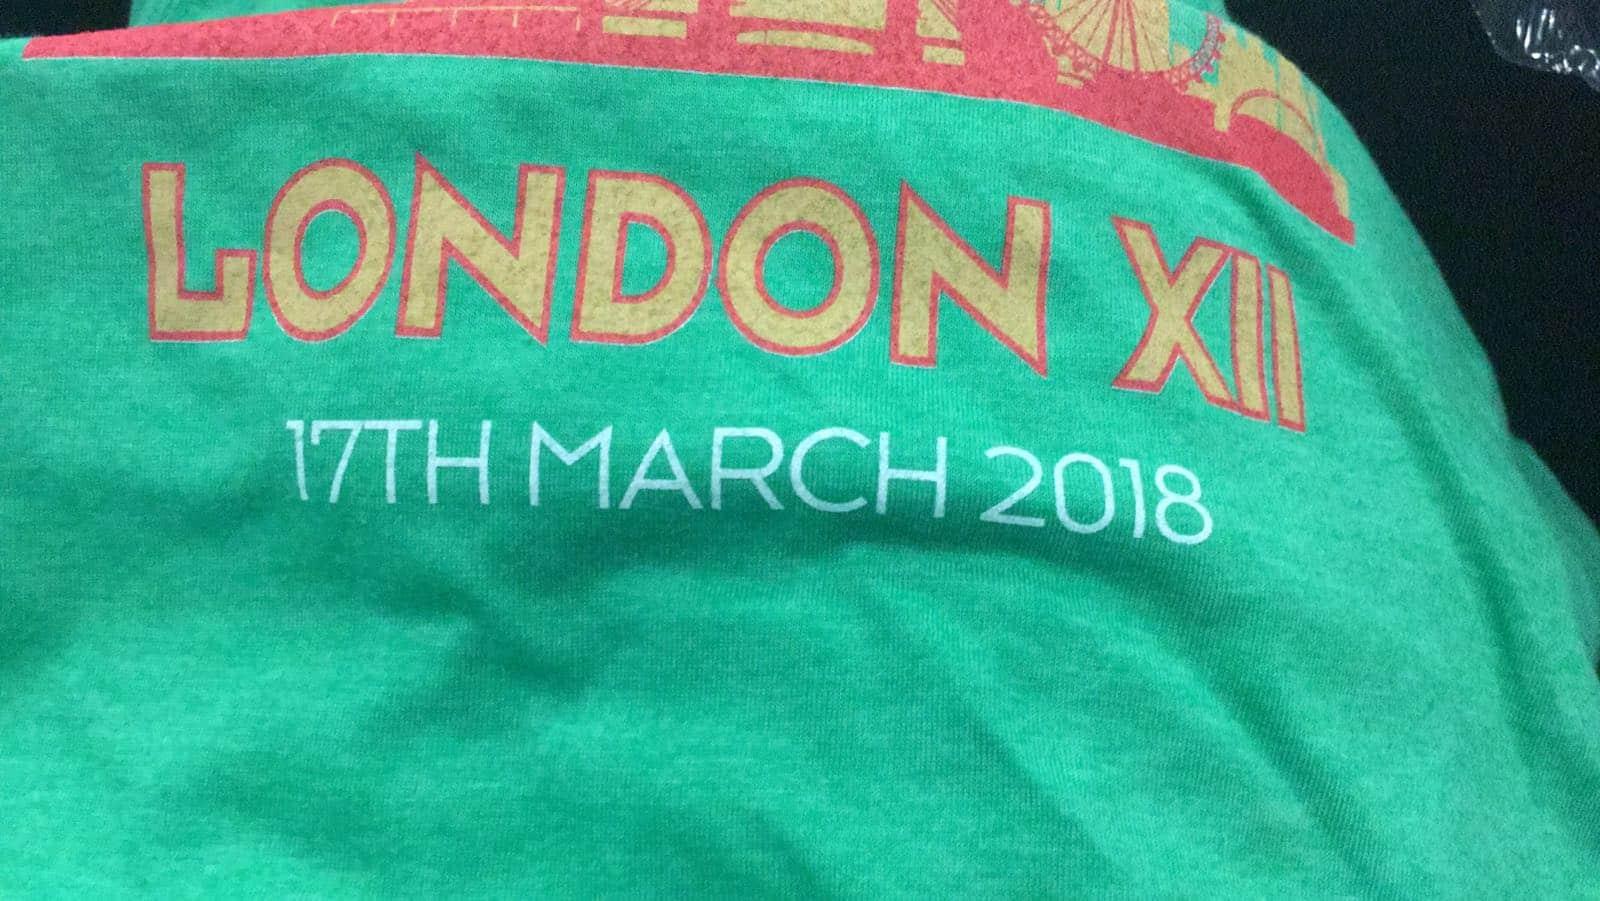 MeasureCamp London X11 2018